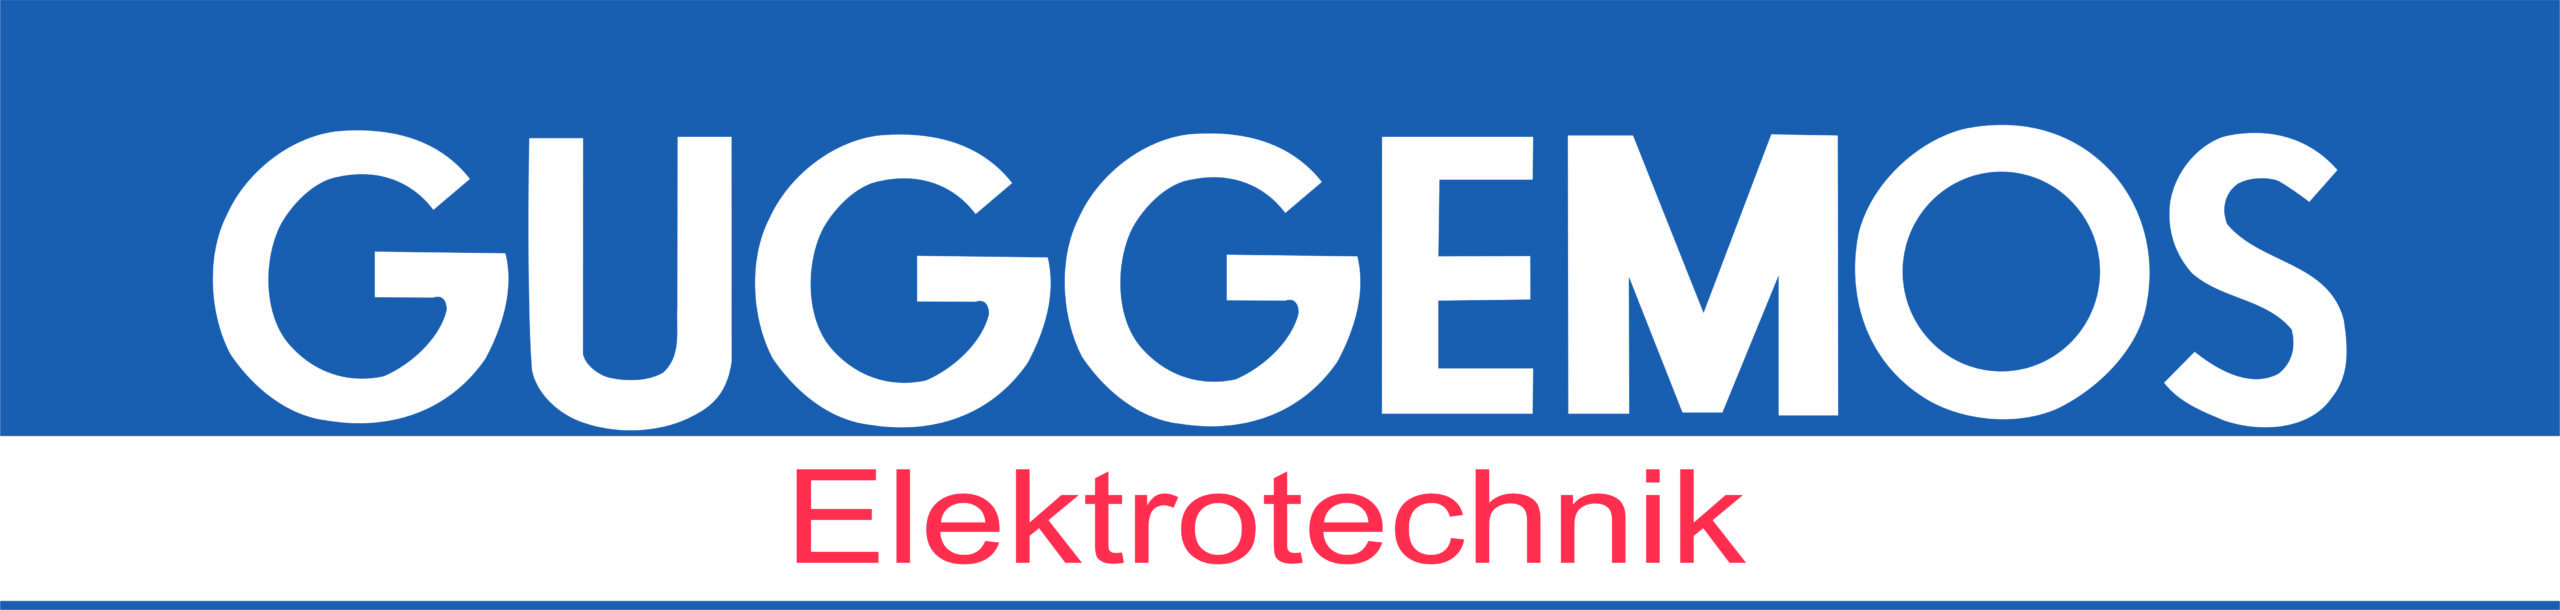 Guggemos Elektrotechnik Passau